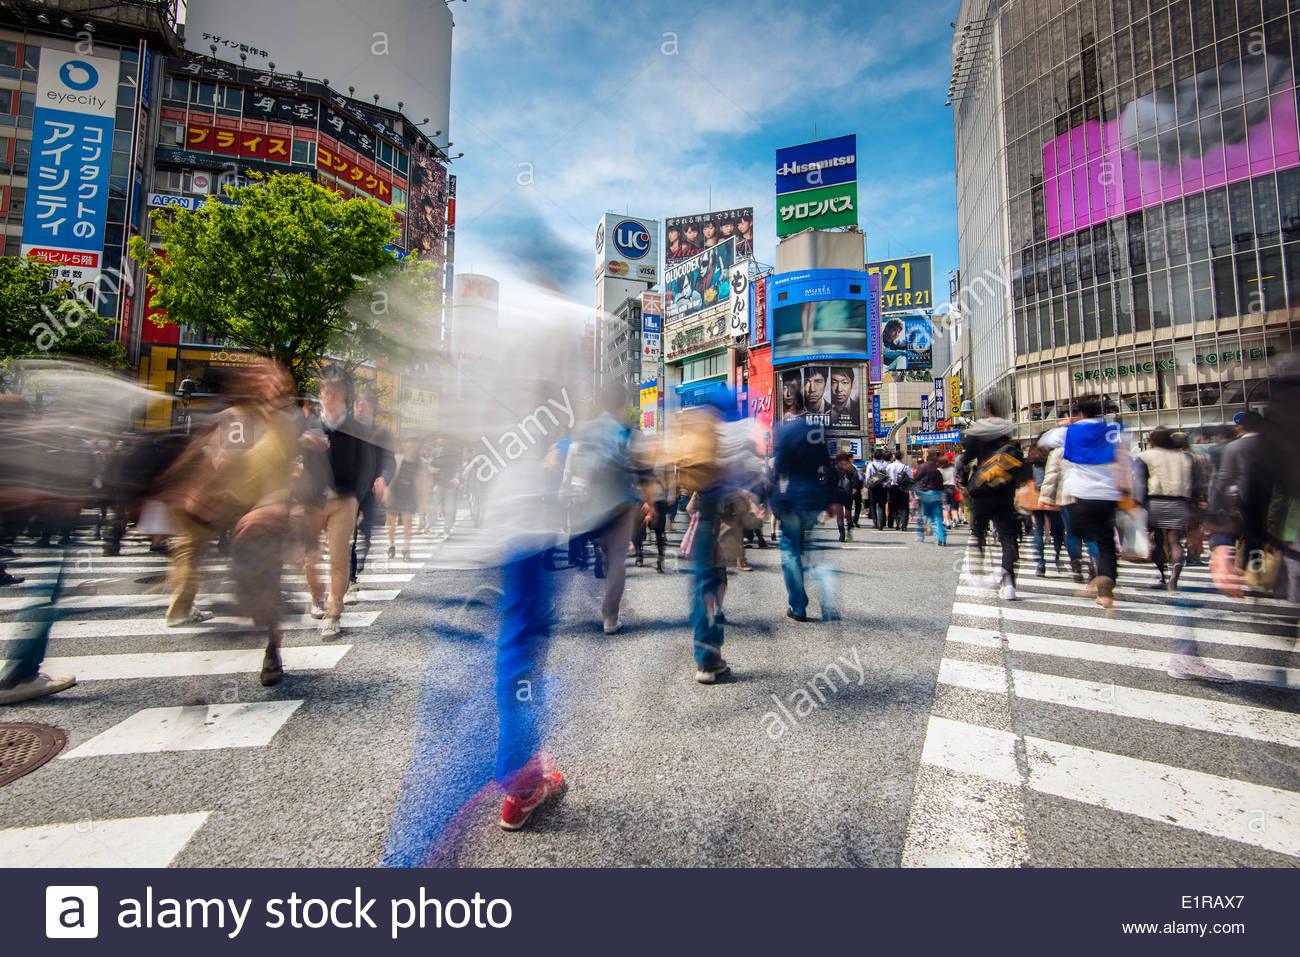 Blurred pedestrians crossing the street at Shibuya crossing, Tokyo, Japan - Stock Image